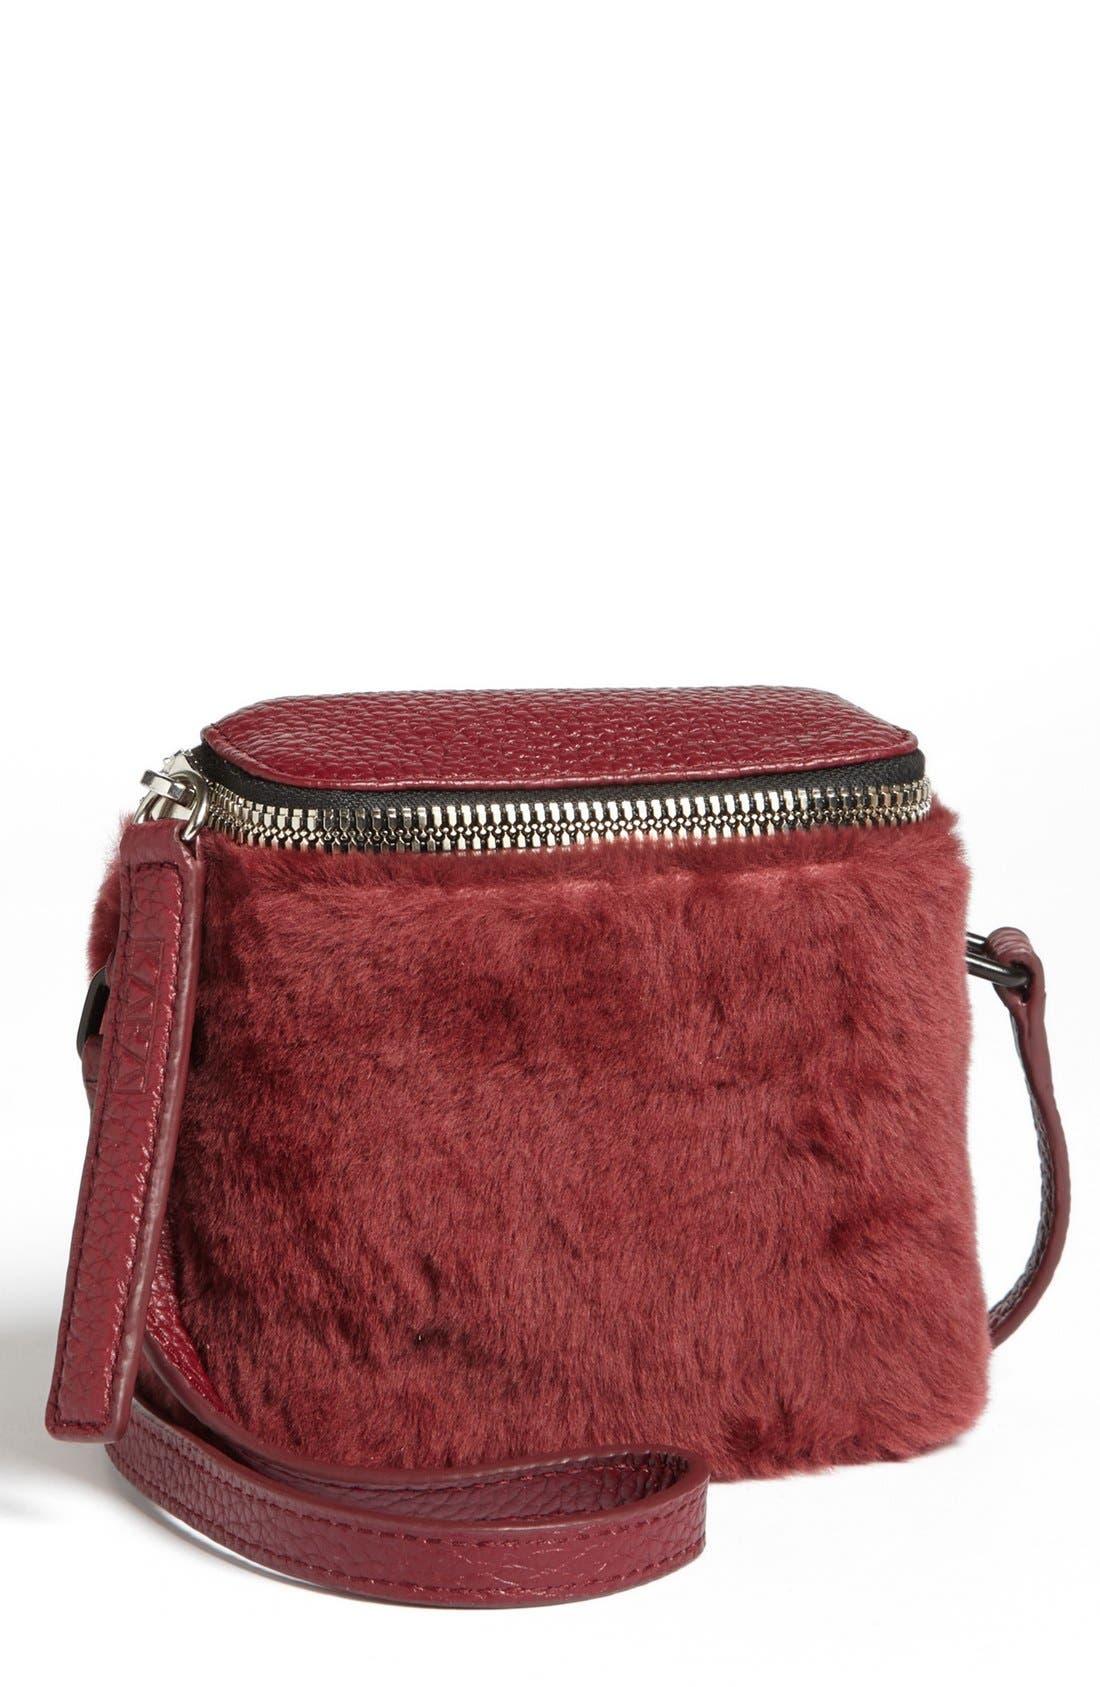 Alternate Image 2  - Kara 'Stowaway' Pebbled Leather & Genuine Shearling Crossbody Bag, Small